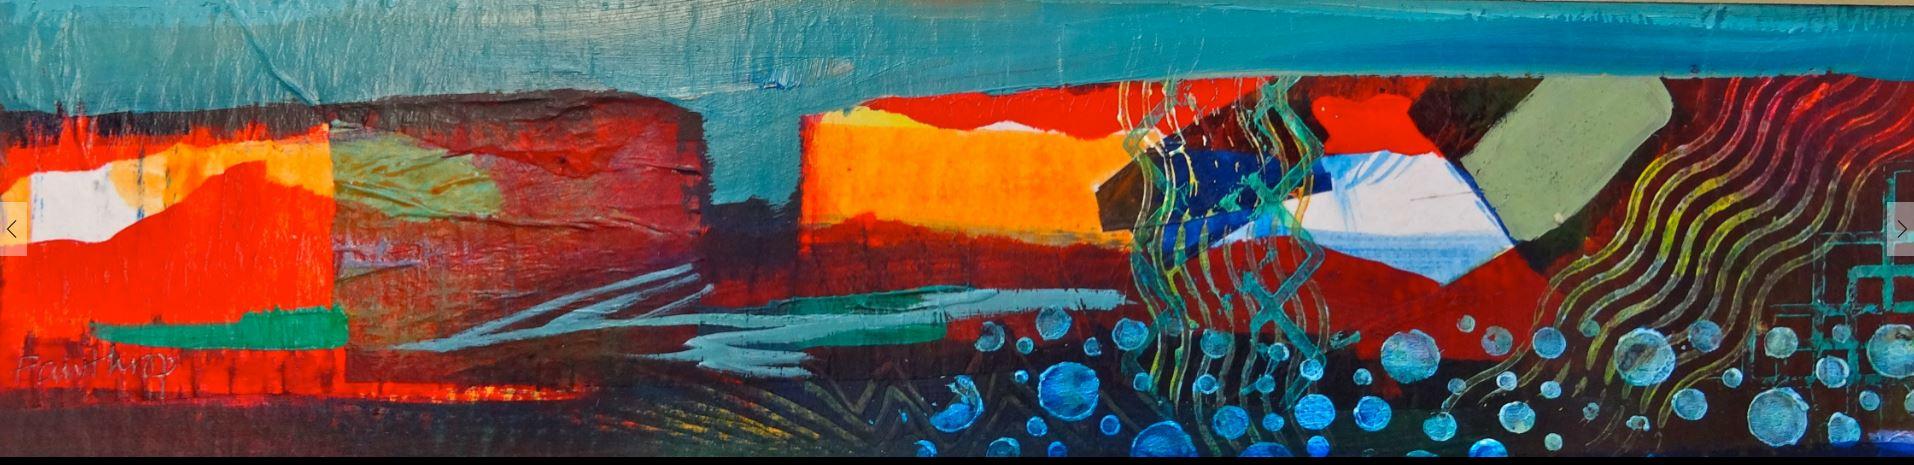 Sea Cliffs, mixed media, 35x7 by Sue Fawthrop